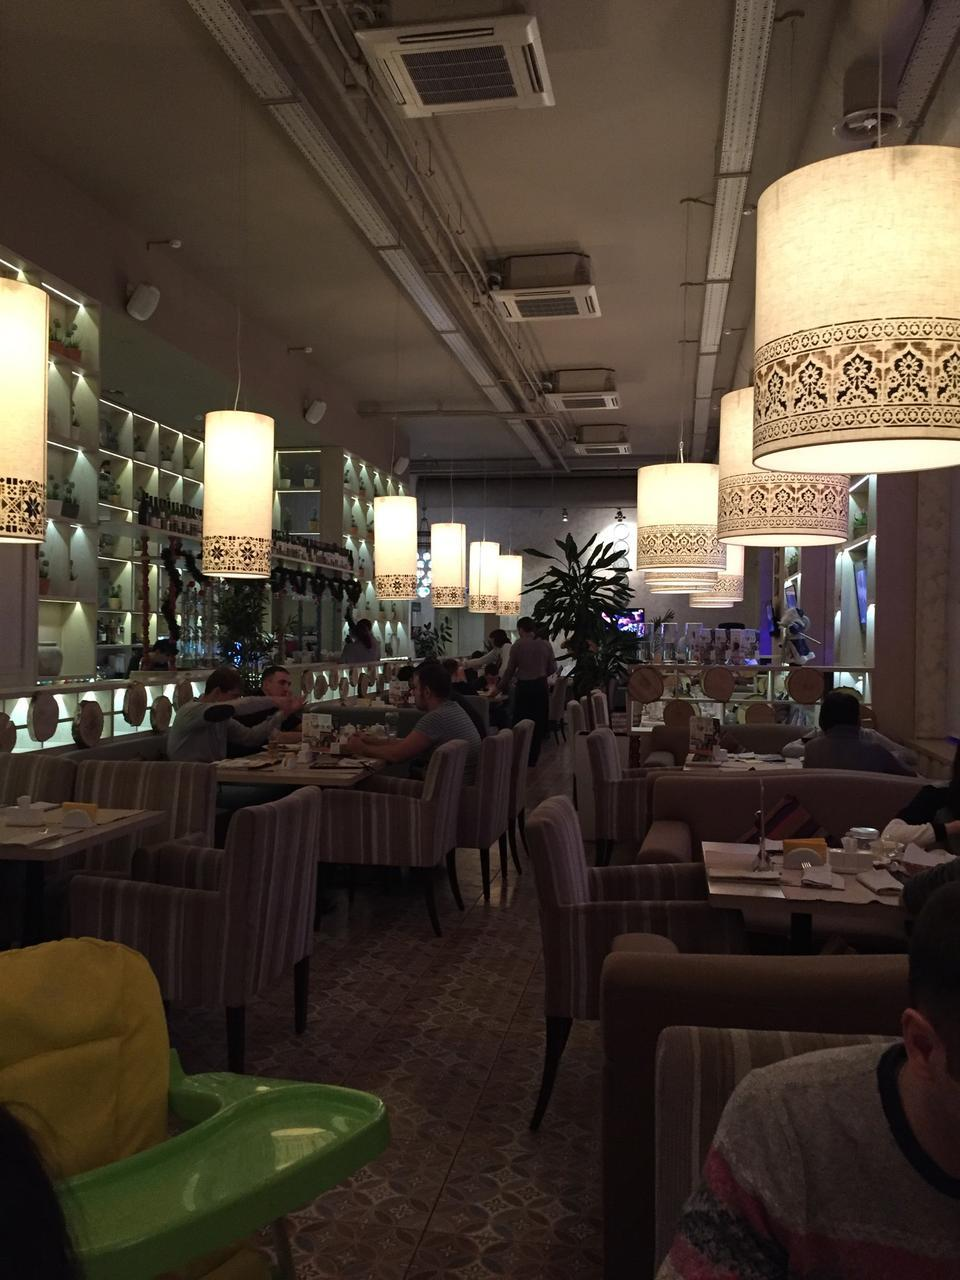 Восточное Кафе Лепешка в Королеве фото 53